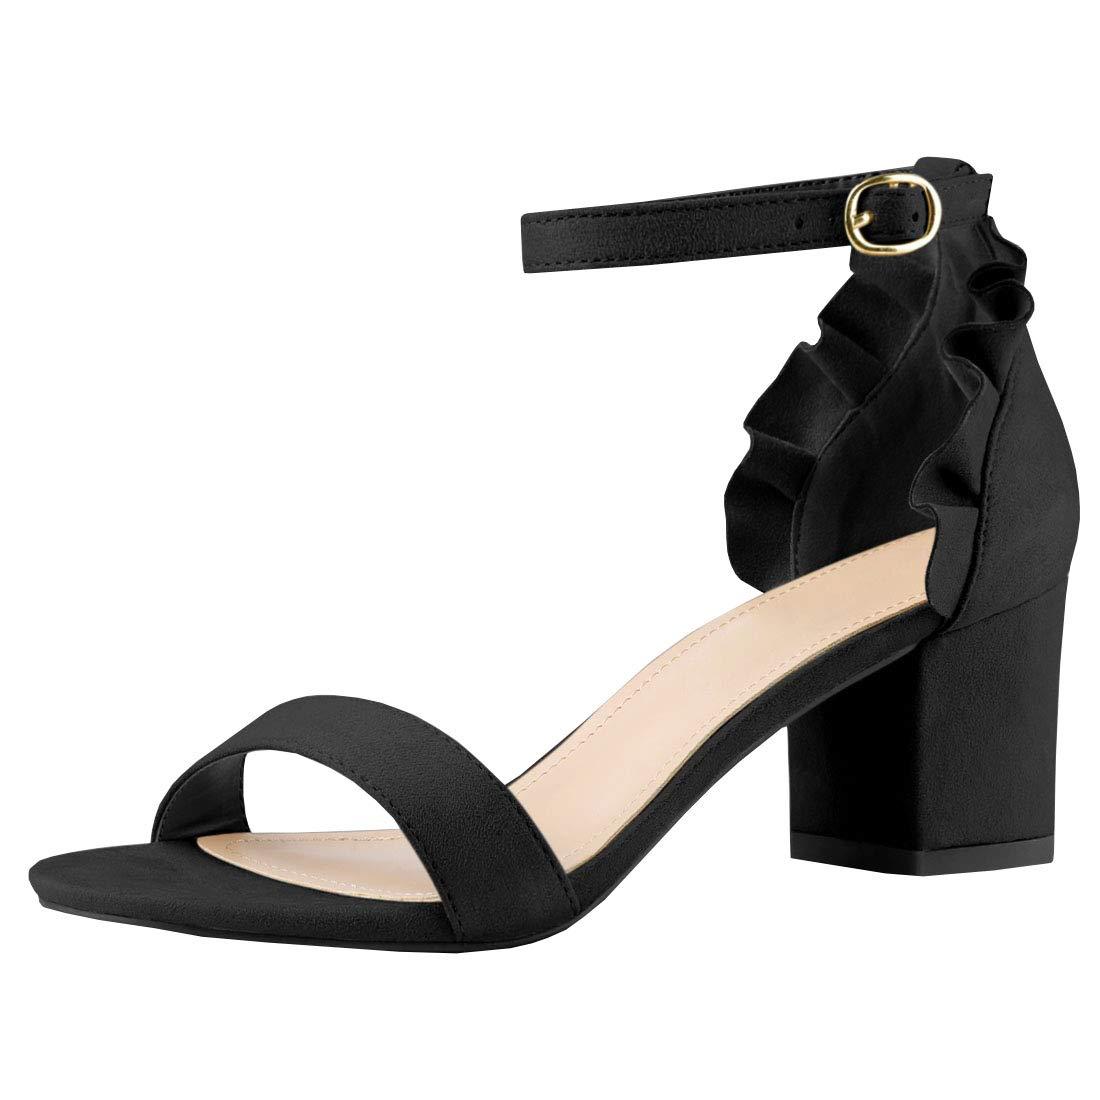 4-black Womens Flat Sandals Ankle Strap Buckle Flip Flop Gladiator Thong Summer shoes